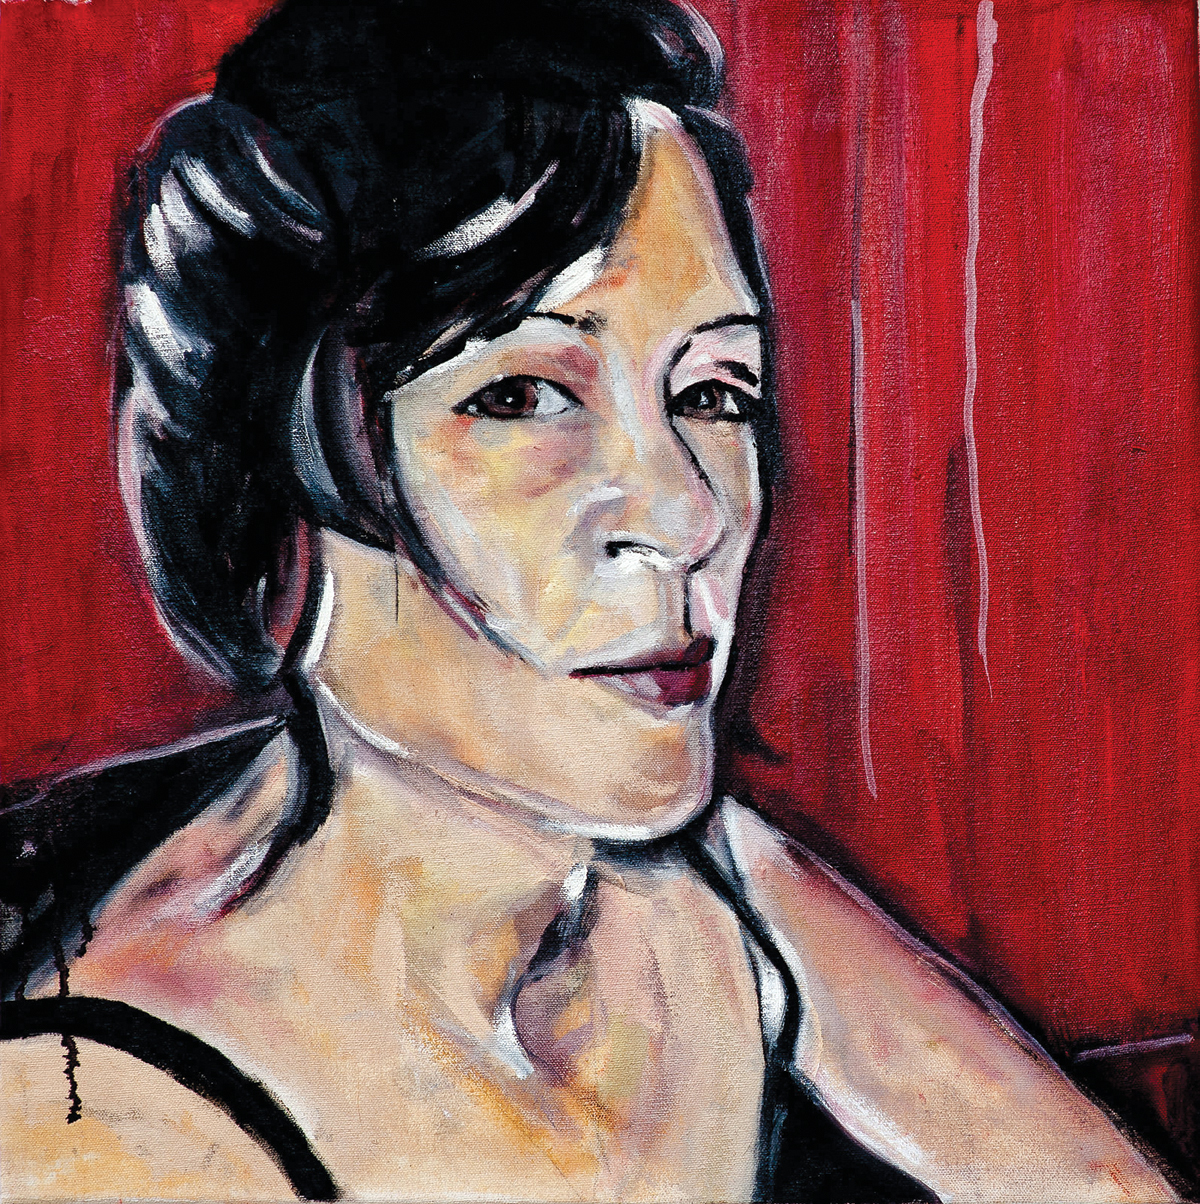 Painting of Hoa Nguyen by Melanie Janisse-Barlow